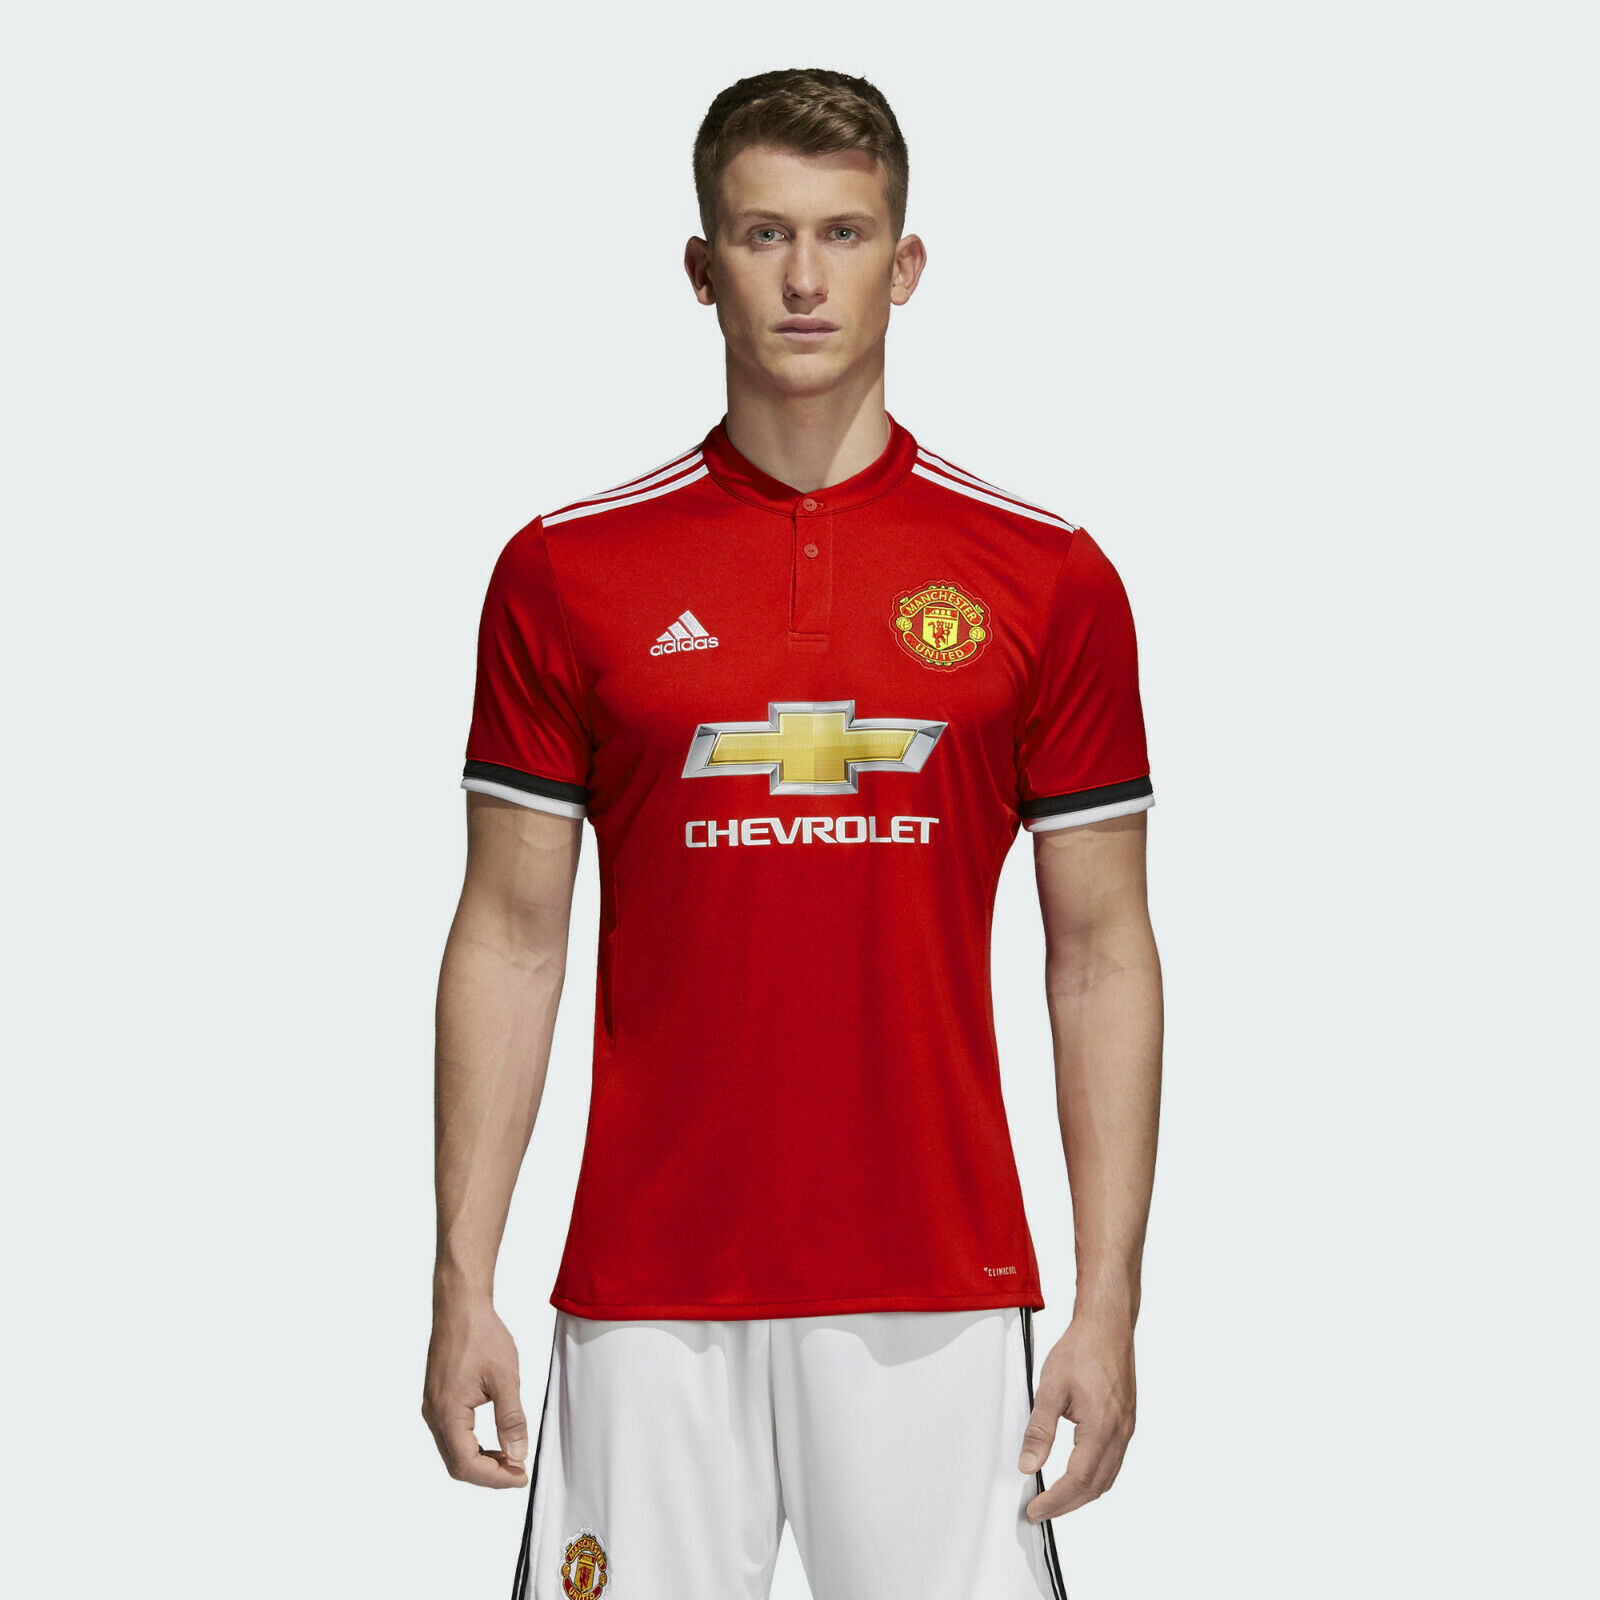 Adidas Manchester United Home 2017 18  Para Hombres Camisa De Fútbol Talla M  Disfruta de un 50% de descuento.